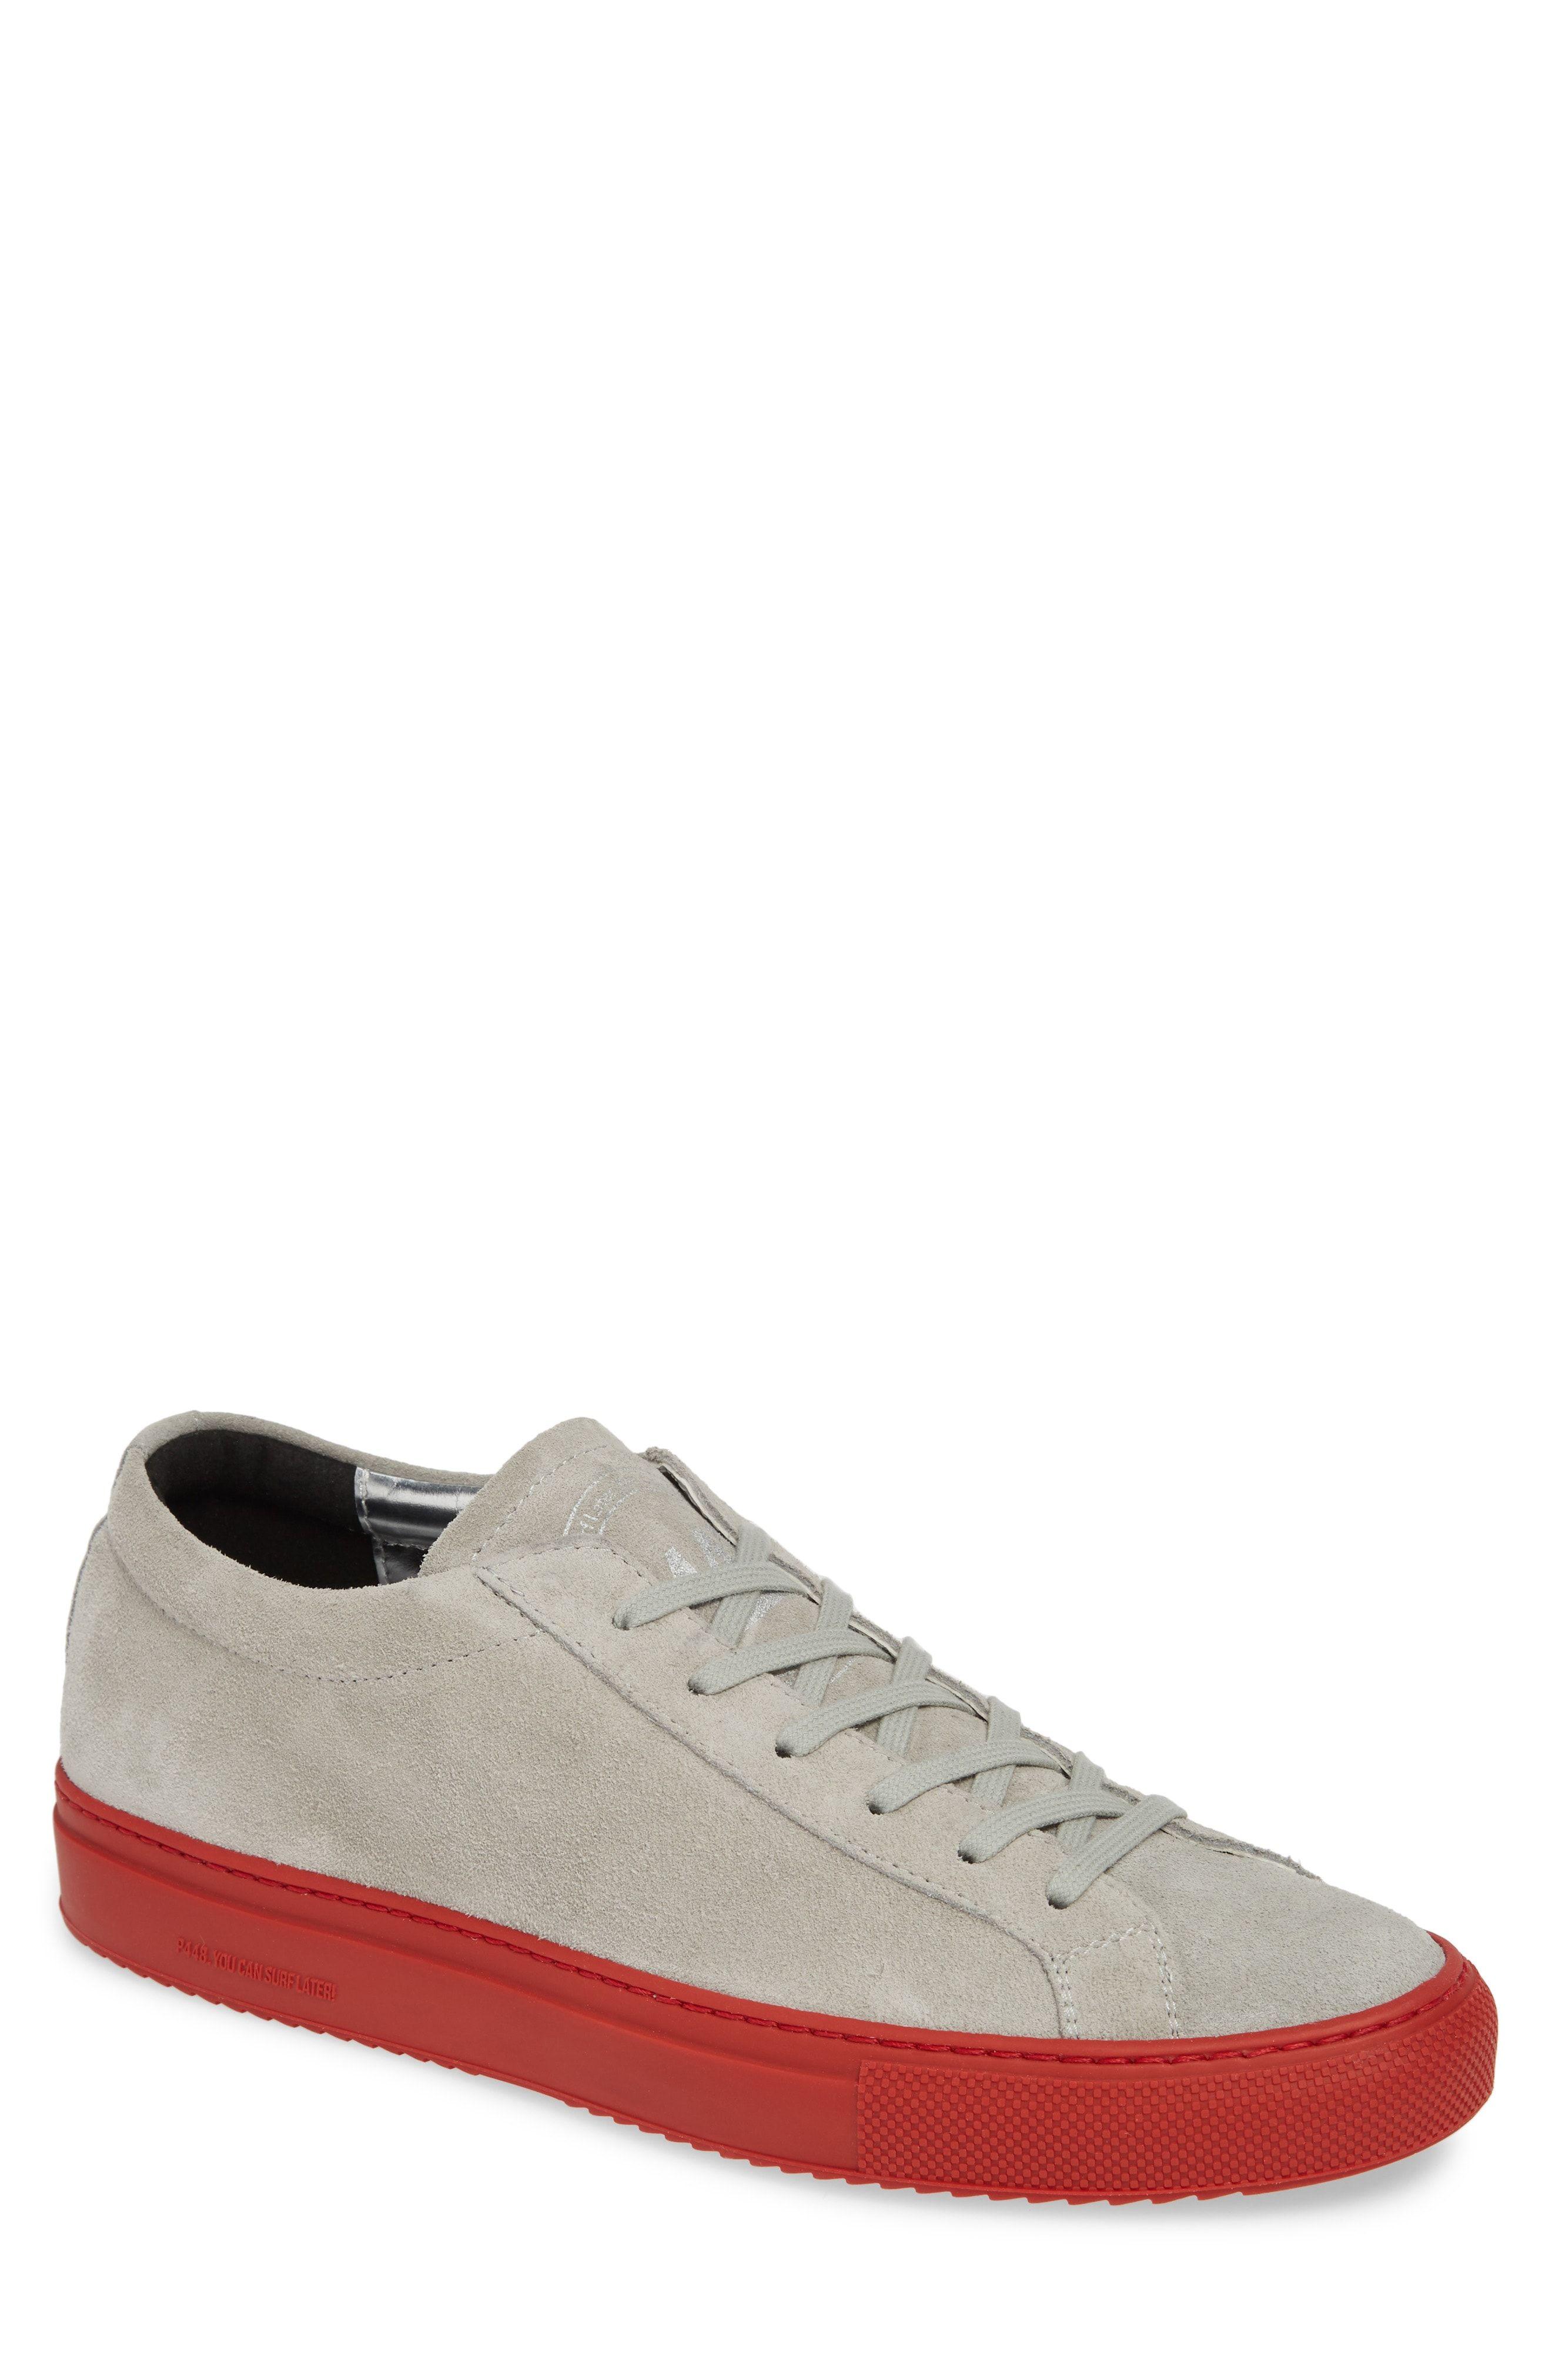 9cd4af3d475 P448 ONEF LOW TOP SNEAKER.  p448  shoes